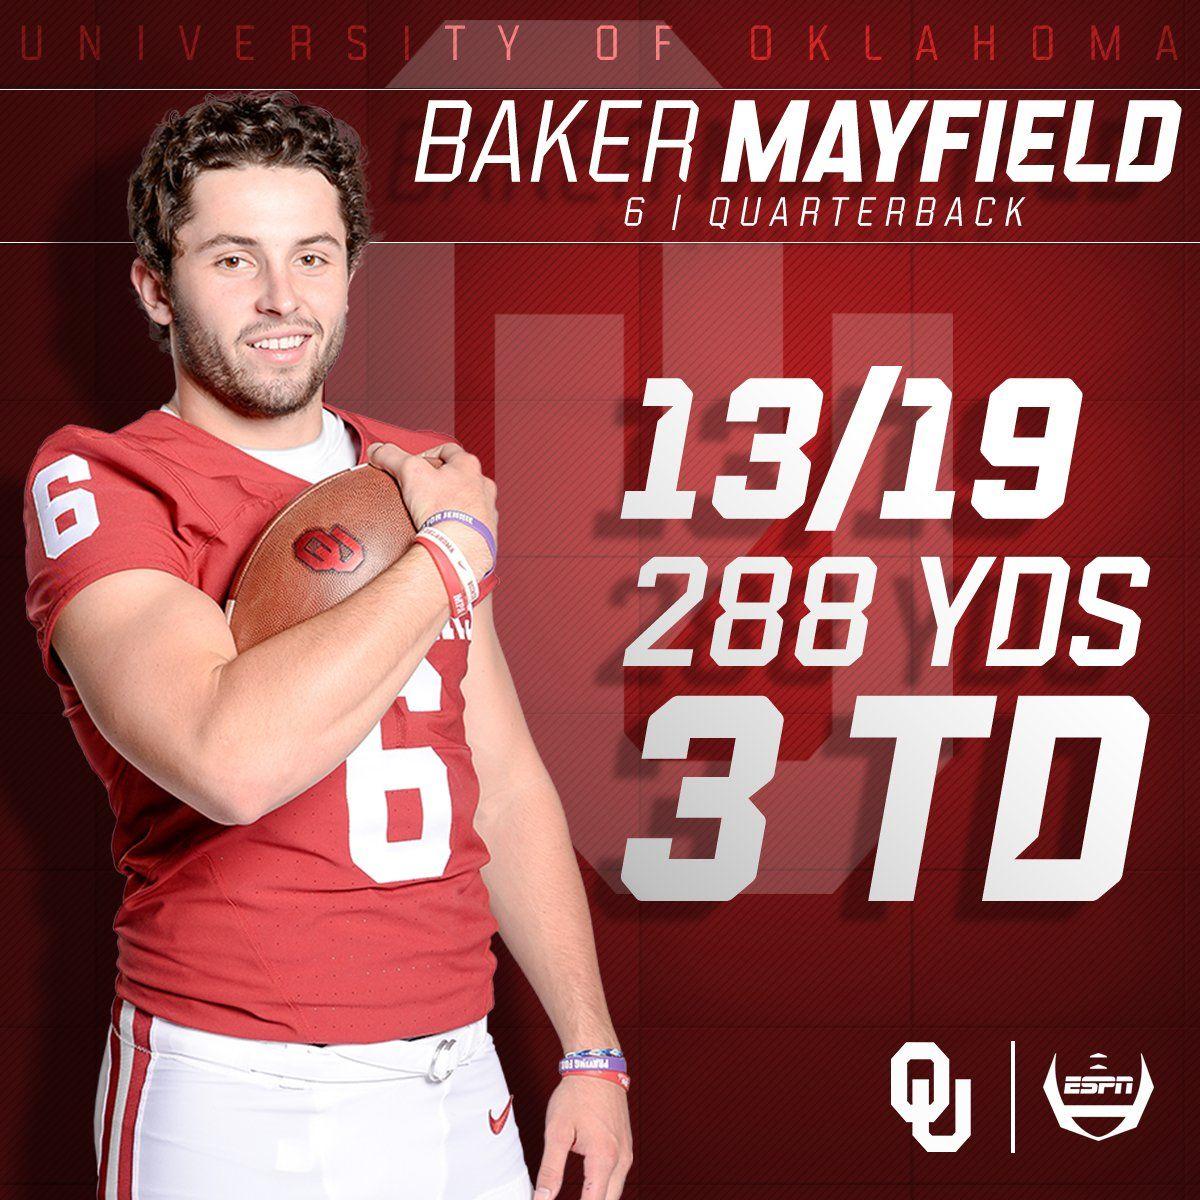 ESPN College Football on Espn college football, Baker